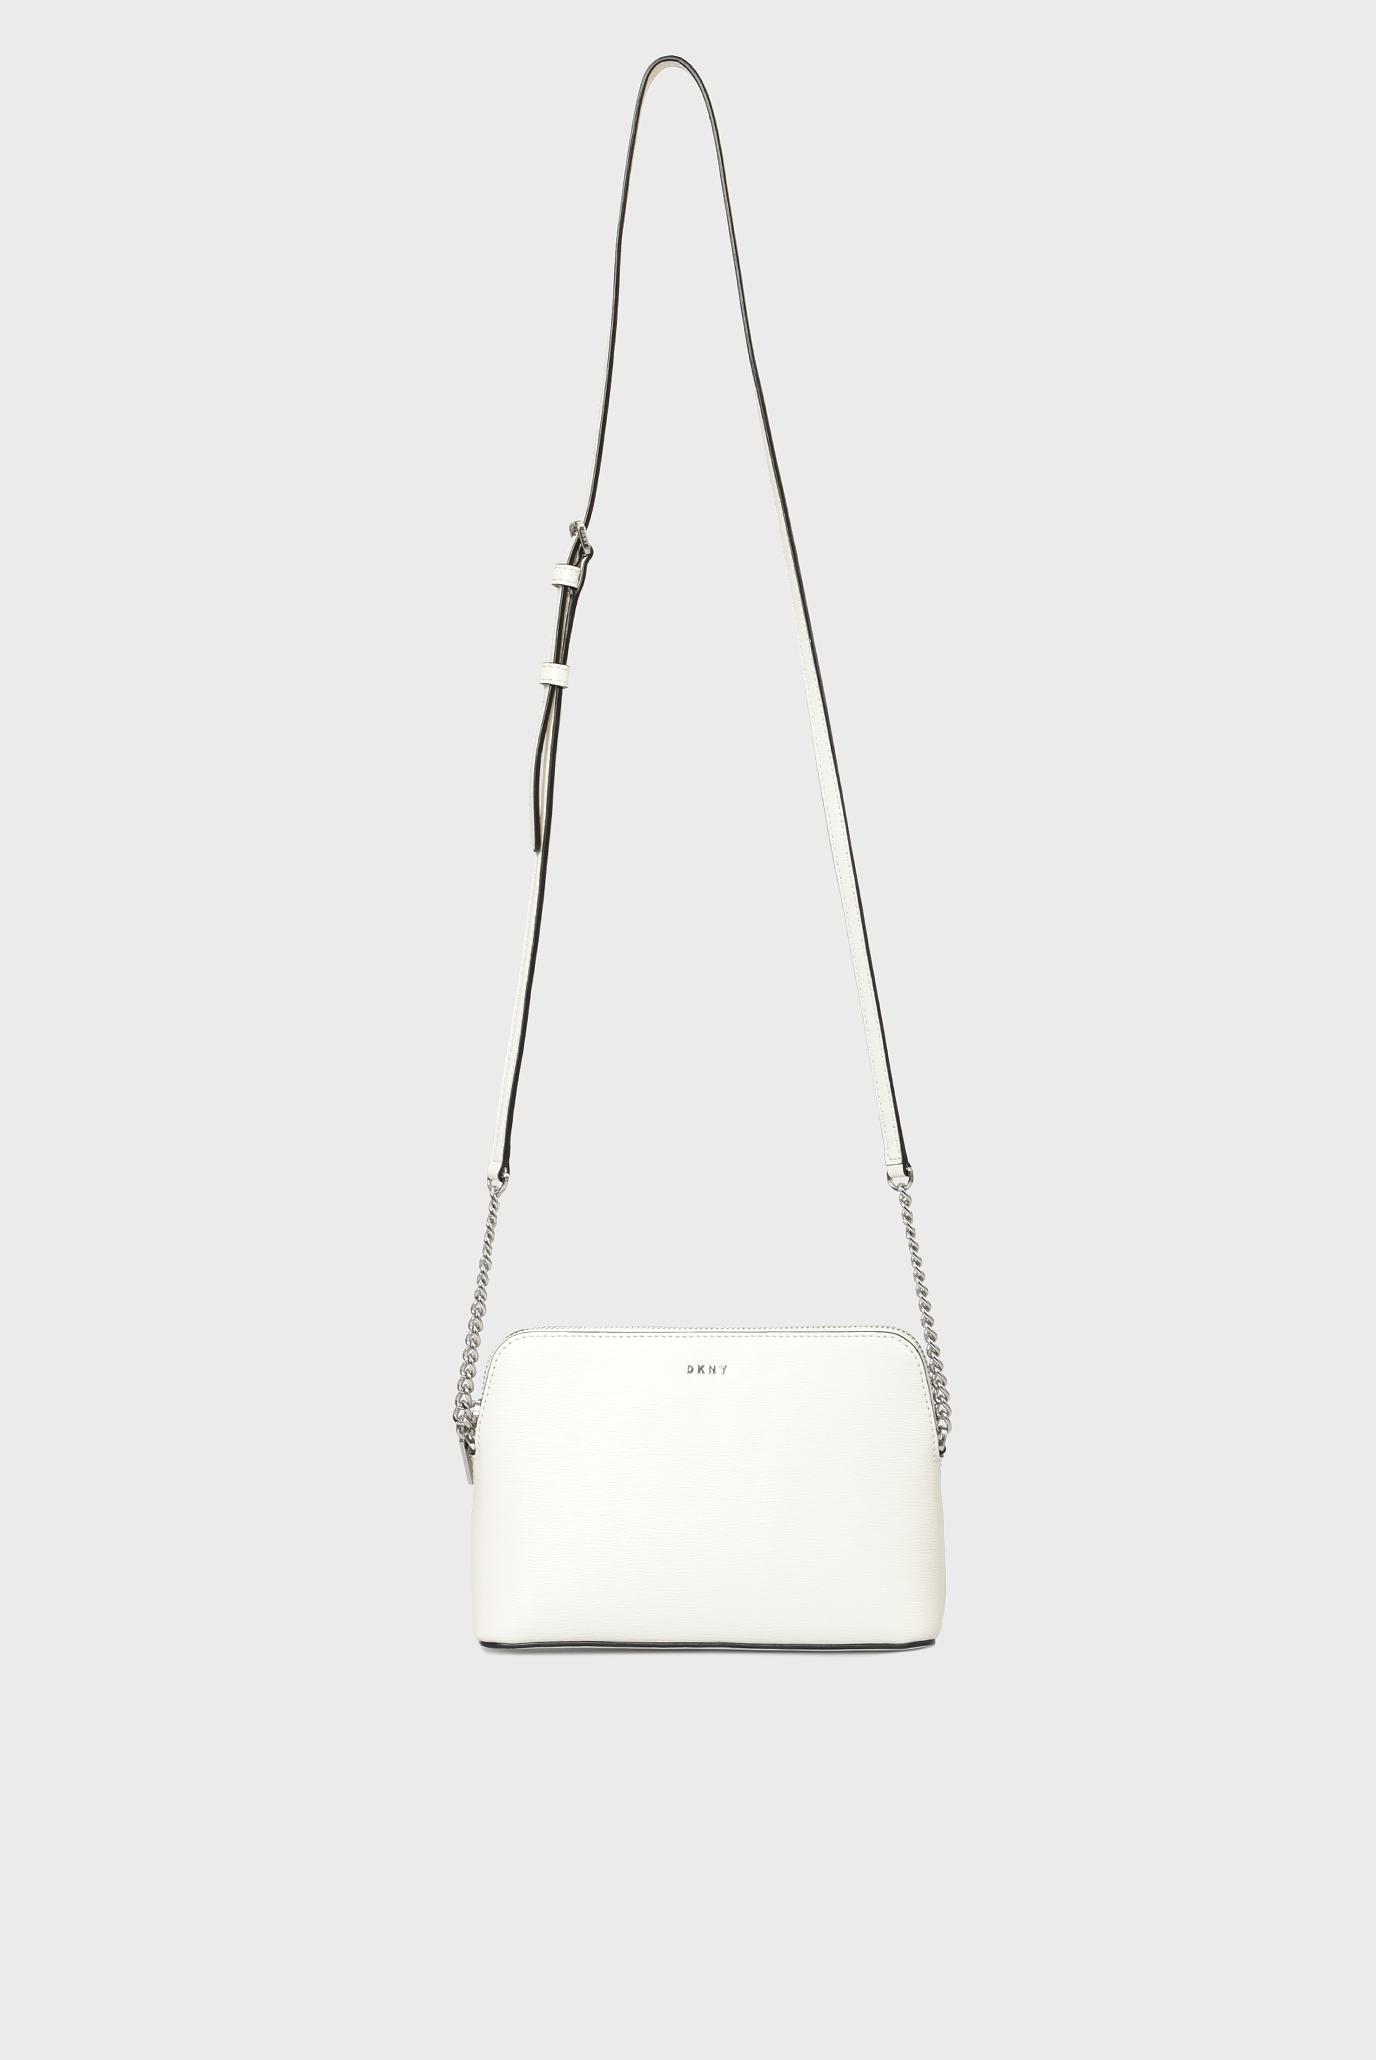 fb53202ac177 Купить Женская белая кожаная сумка через плечо BRYANT-DOME DKNY DKNY  R83E3655 – Киев, Украина. Цены в интернет магазине MD Fashion